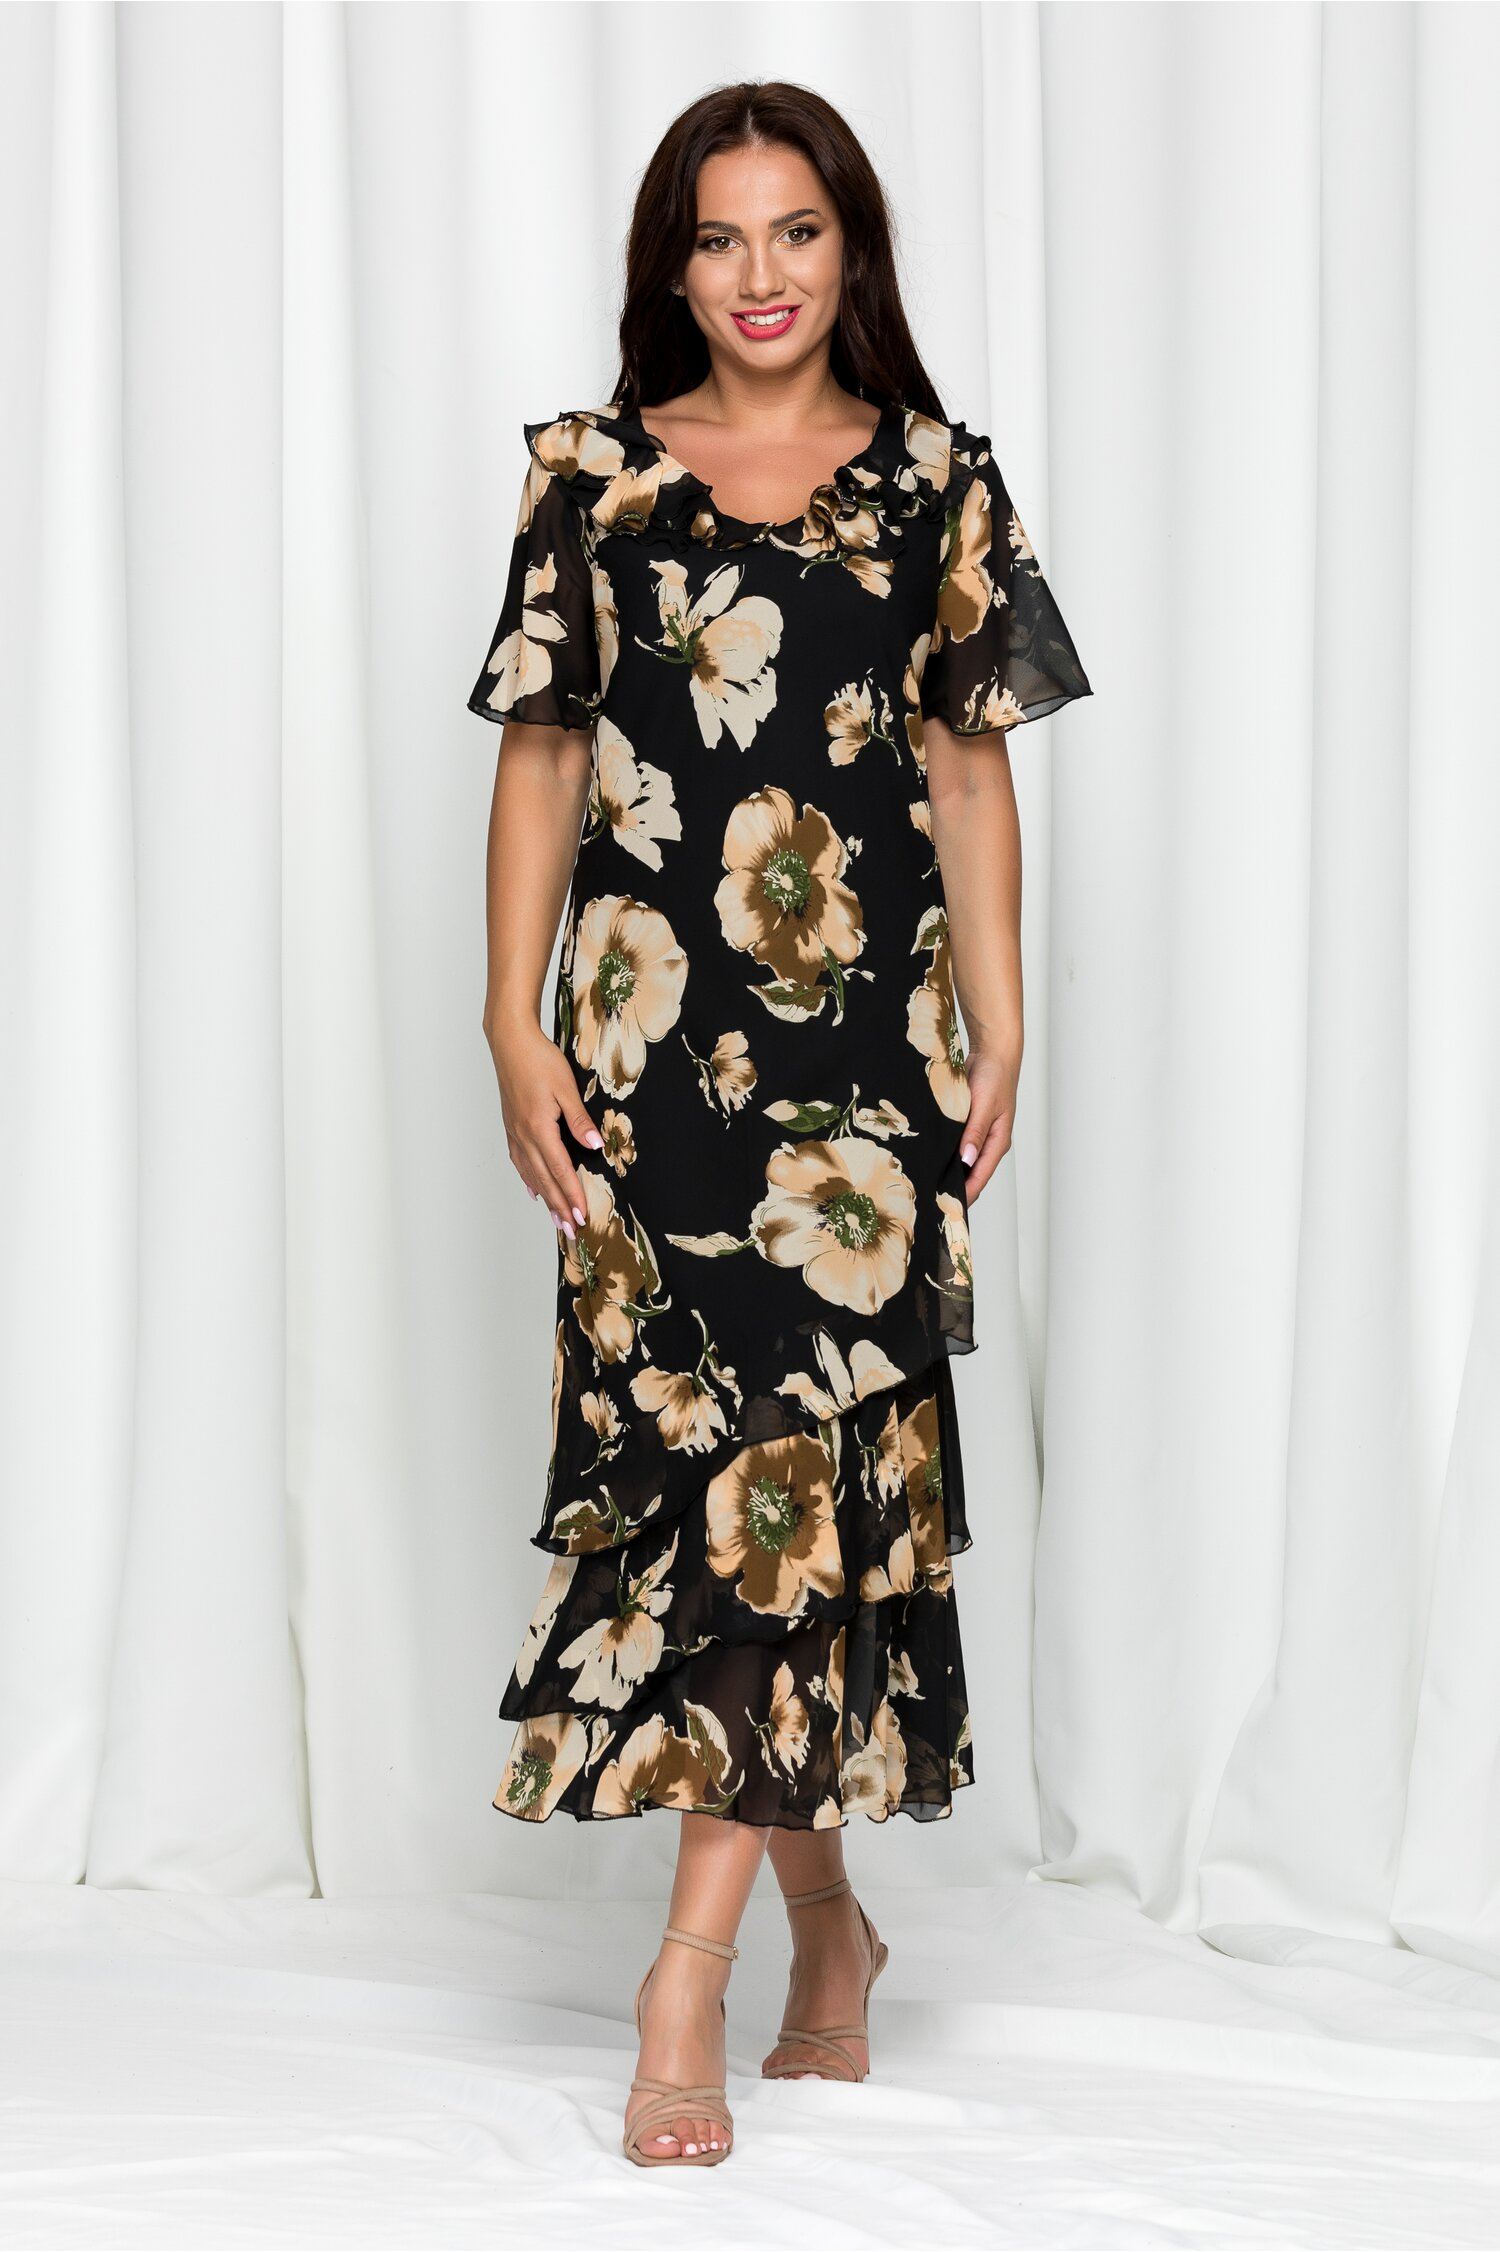 Rochie Raisa neagra cu imprimeu floral crem si volanase